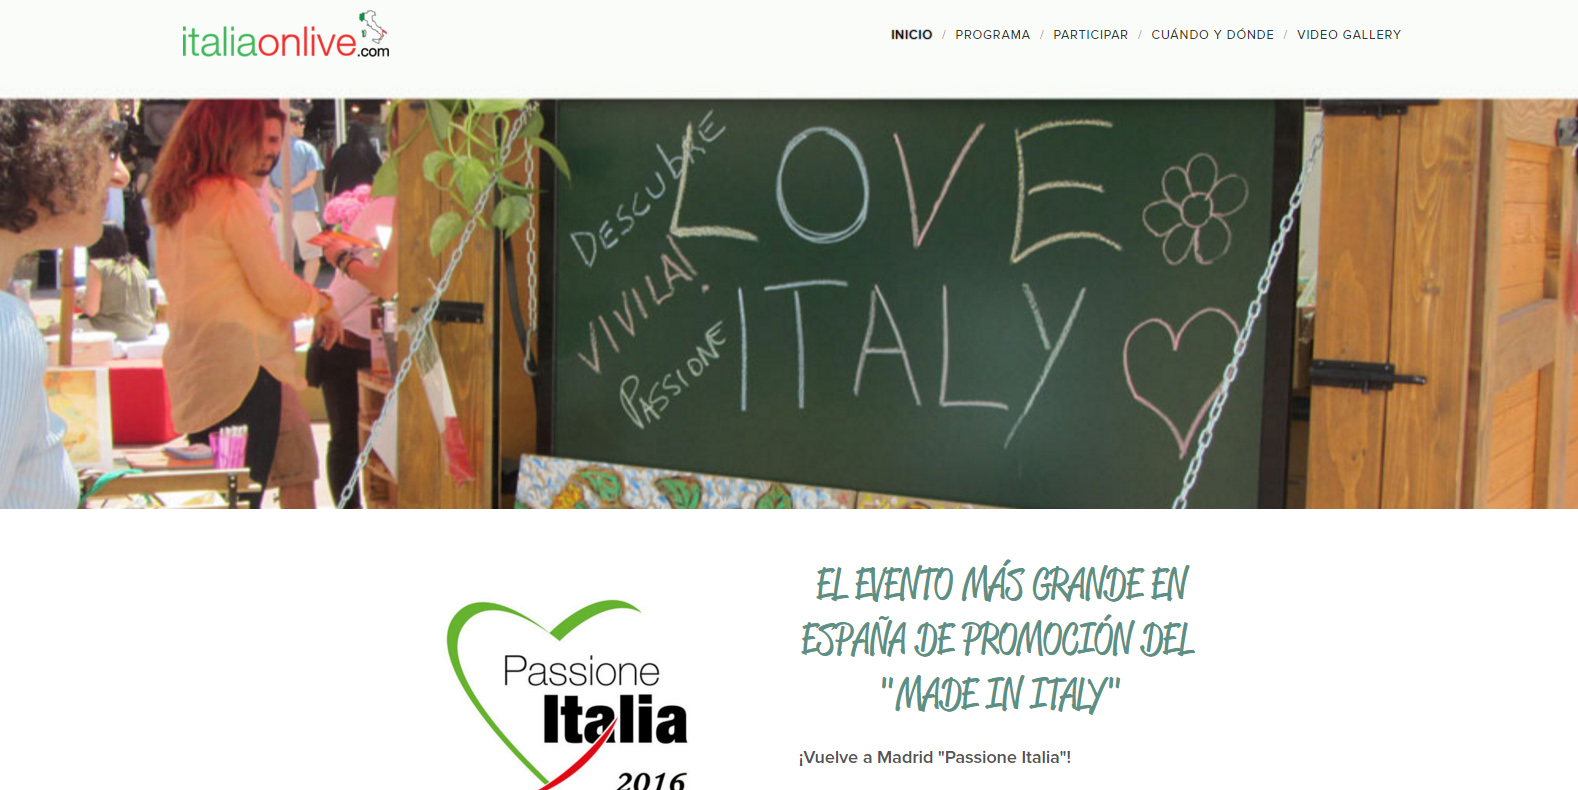 Italiaonlive